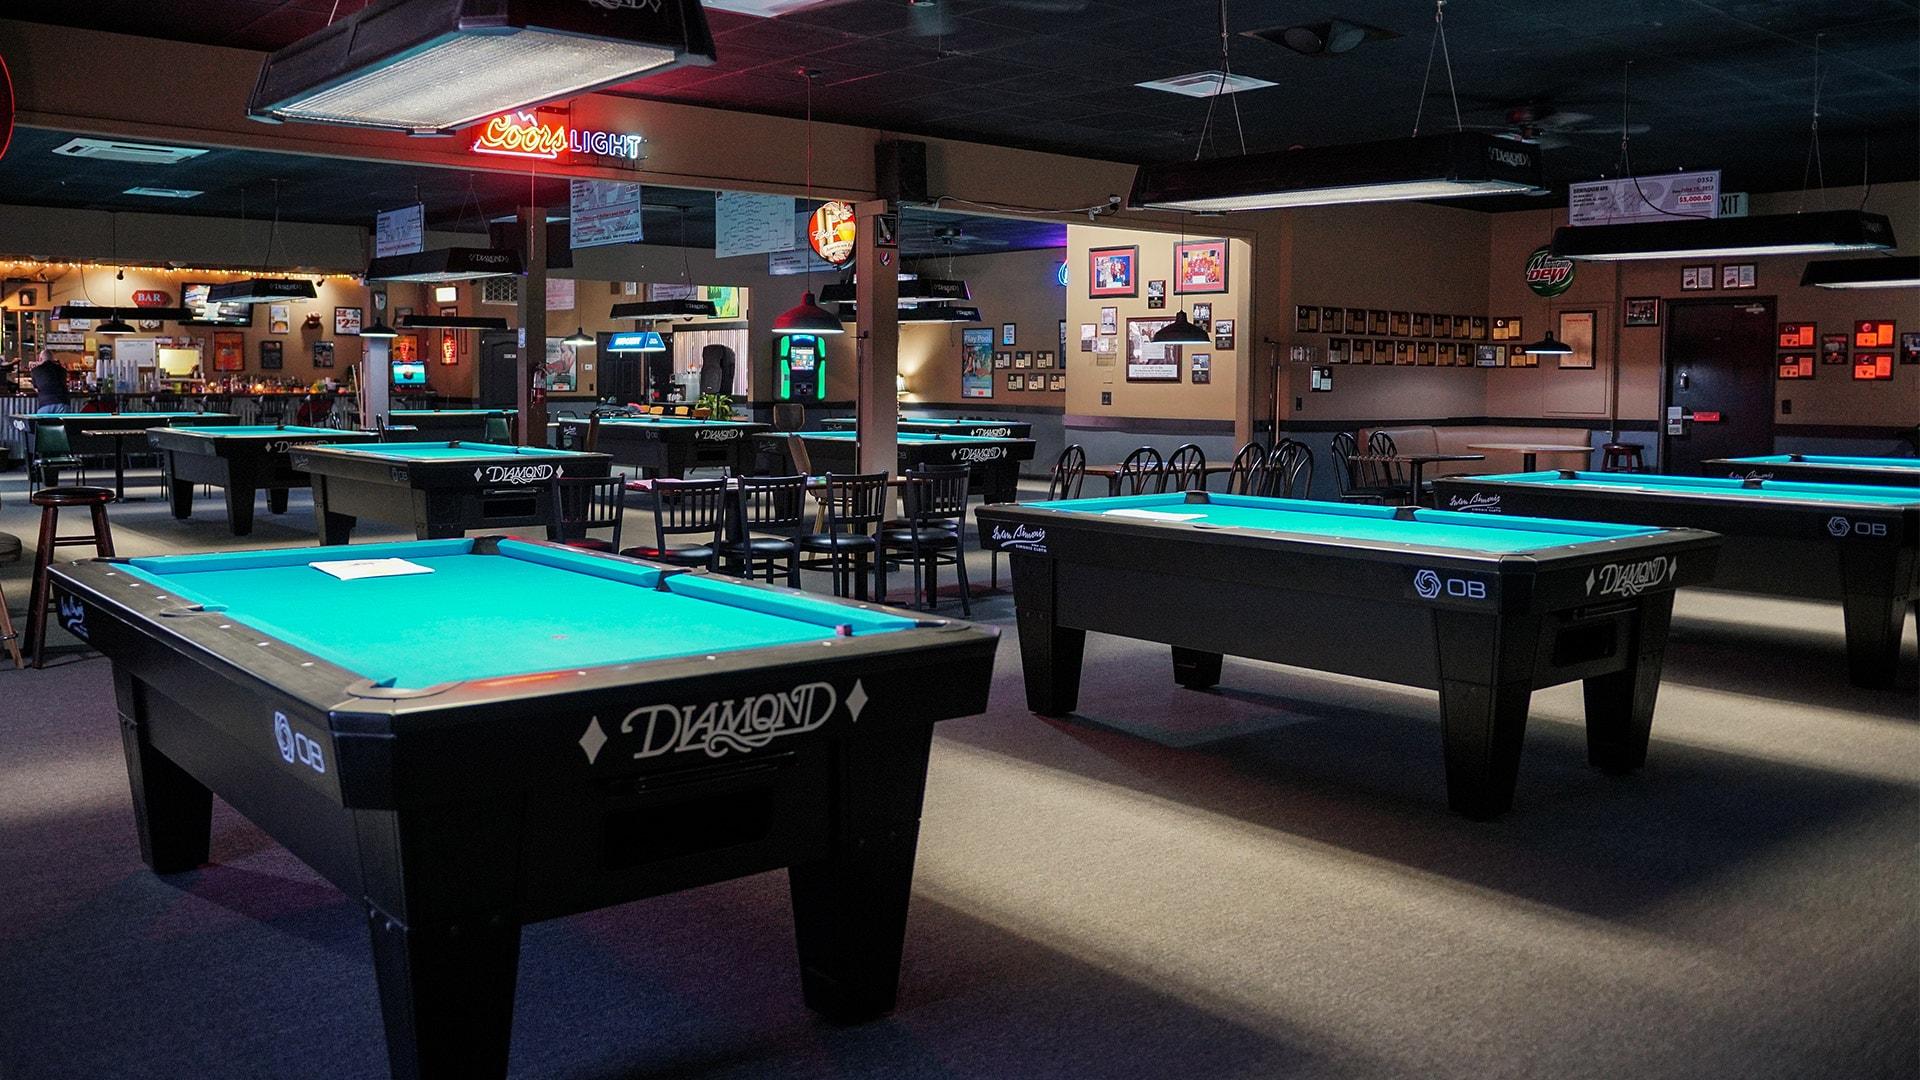 Poppa Gs Billiards Bar Grill Birmingham Pool Hall With - Pool table hall near me